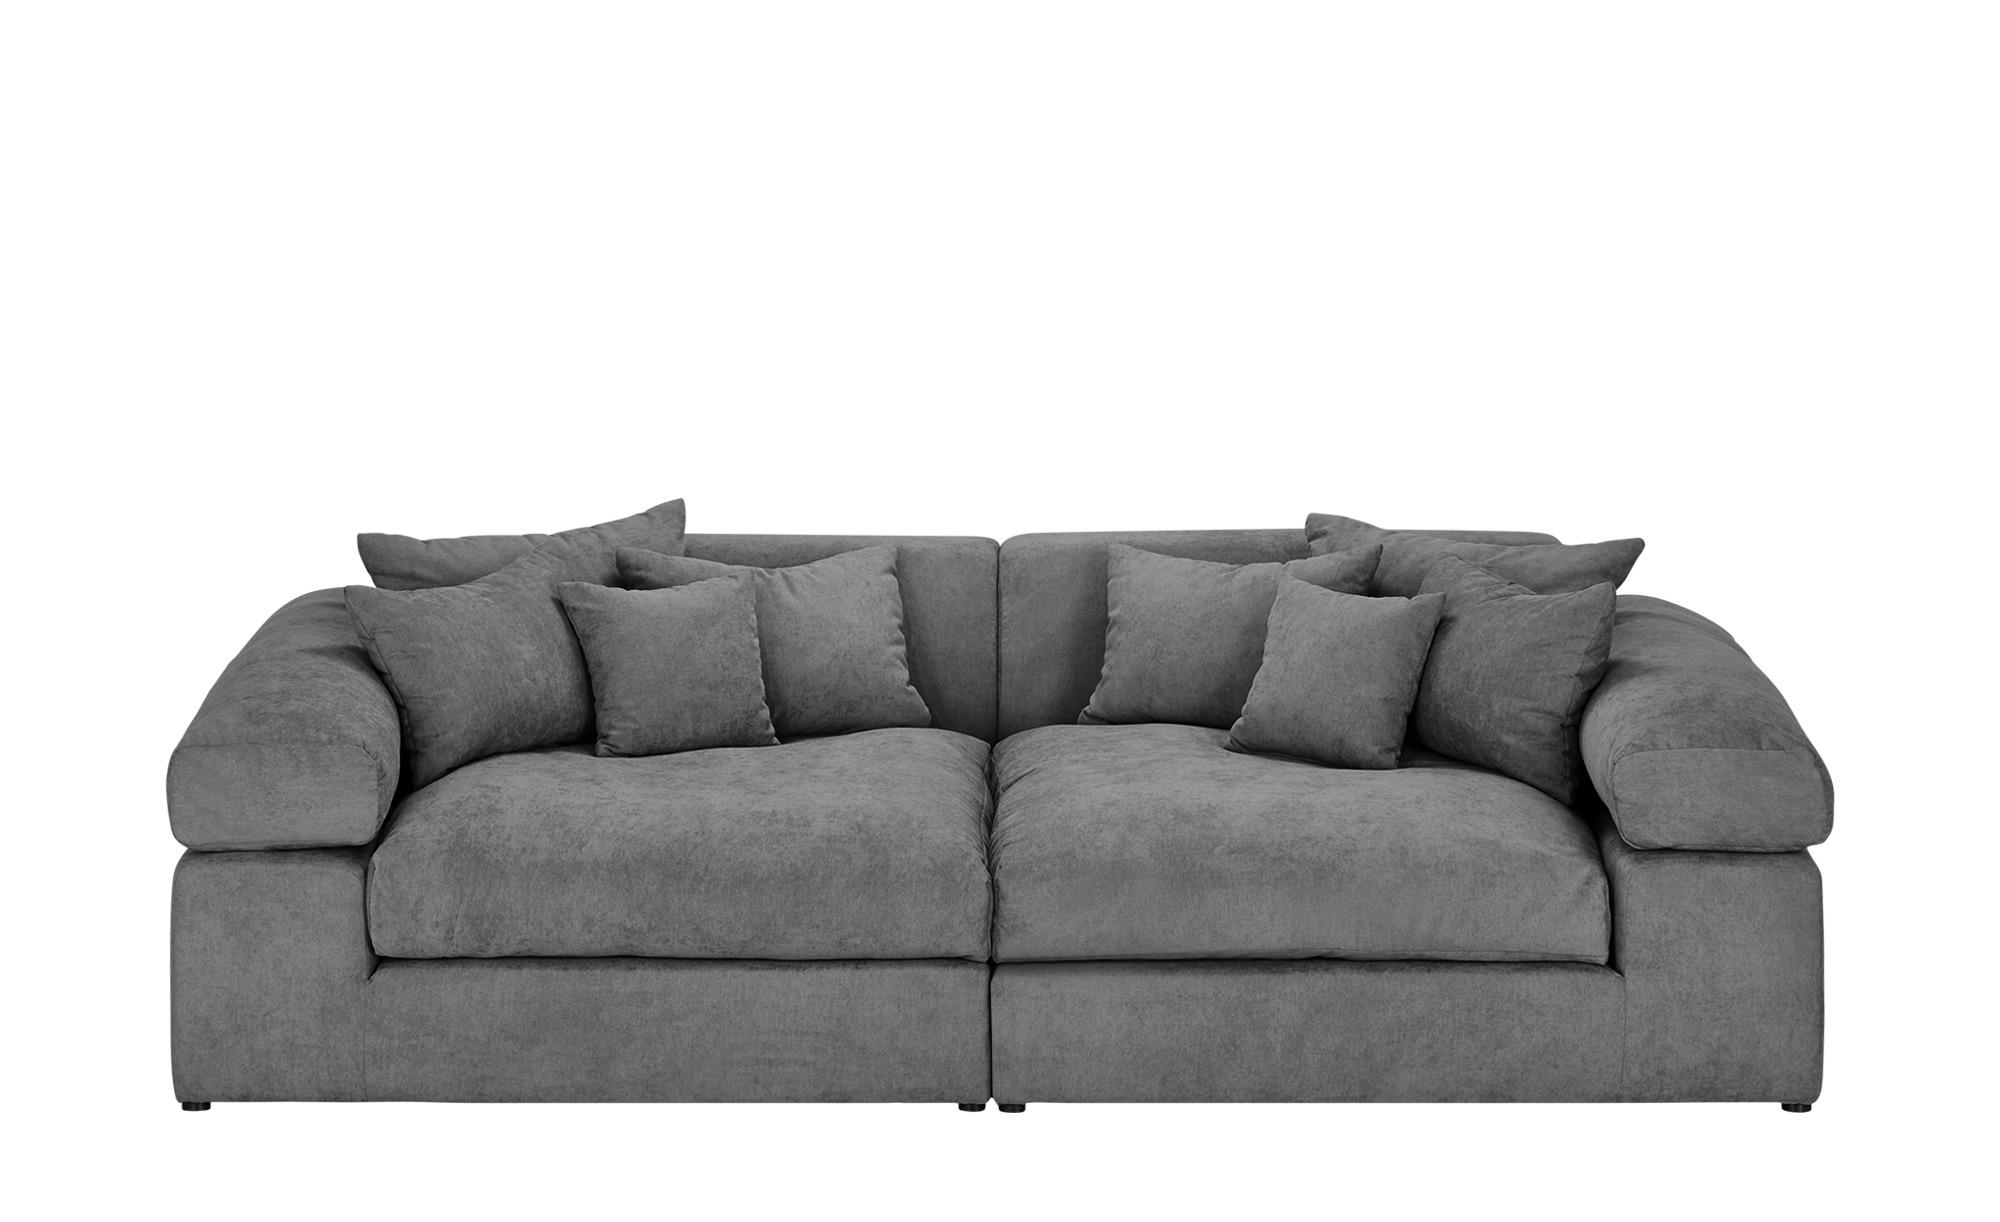 smart big sofa grau flachgewebe lianea grau. Black Bedroom Furniture Sets. Home Design Ideas